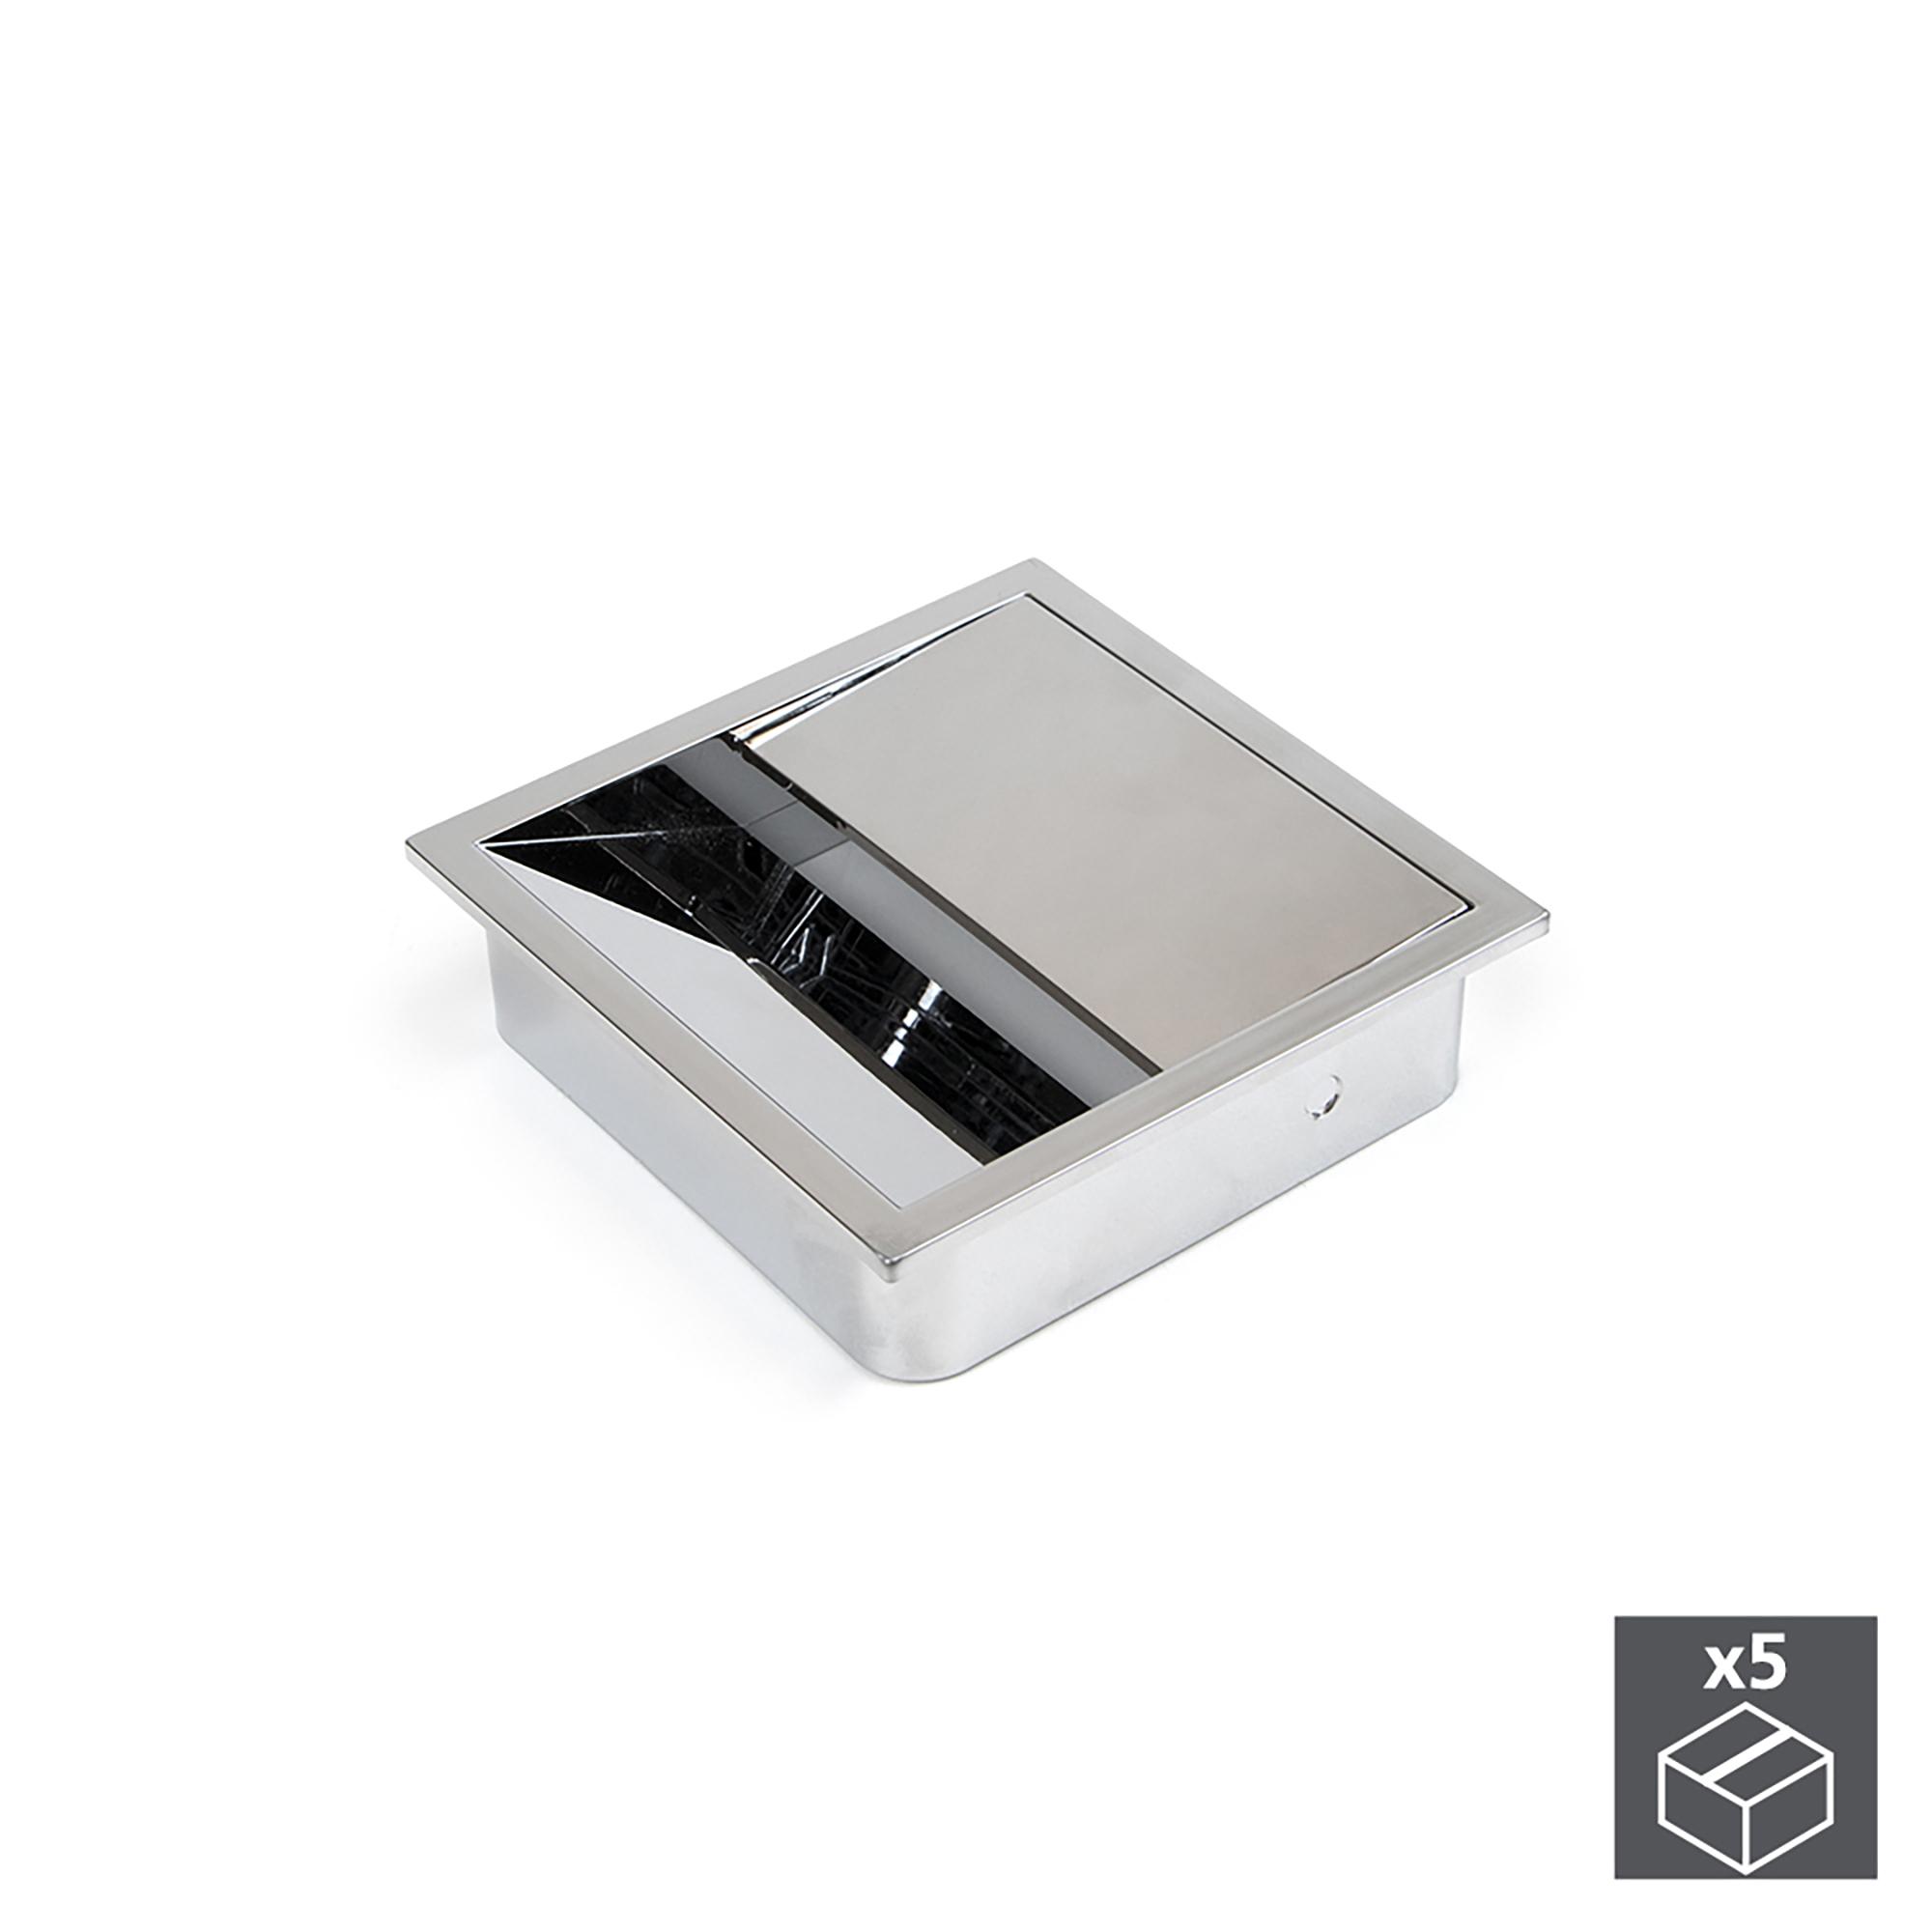 Emuca Passacavi da tavolo, quadrato, 85 x 85 mm, da incasso, Plastica, Cromato, 5 u.